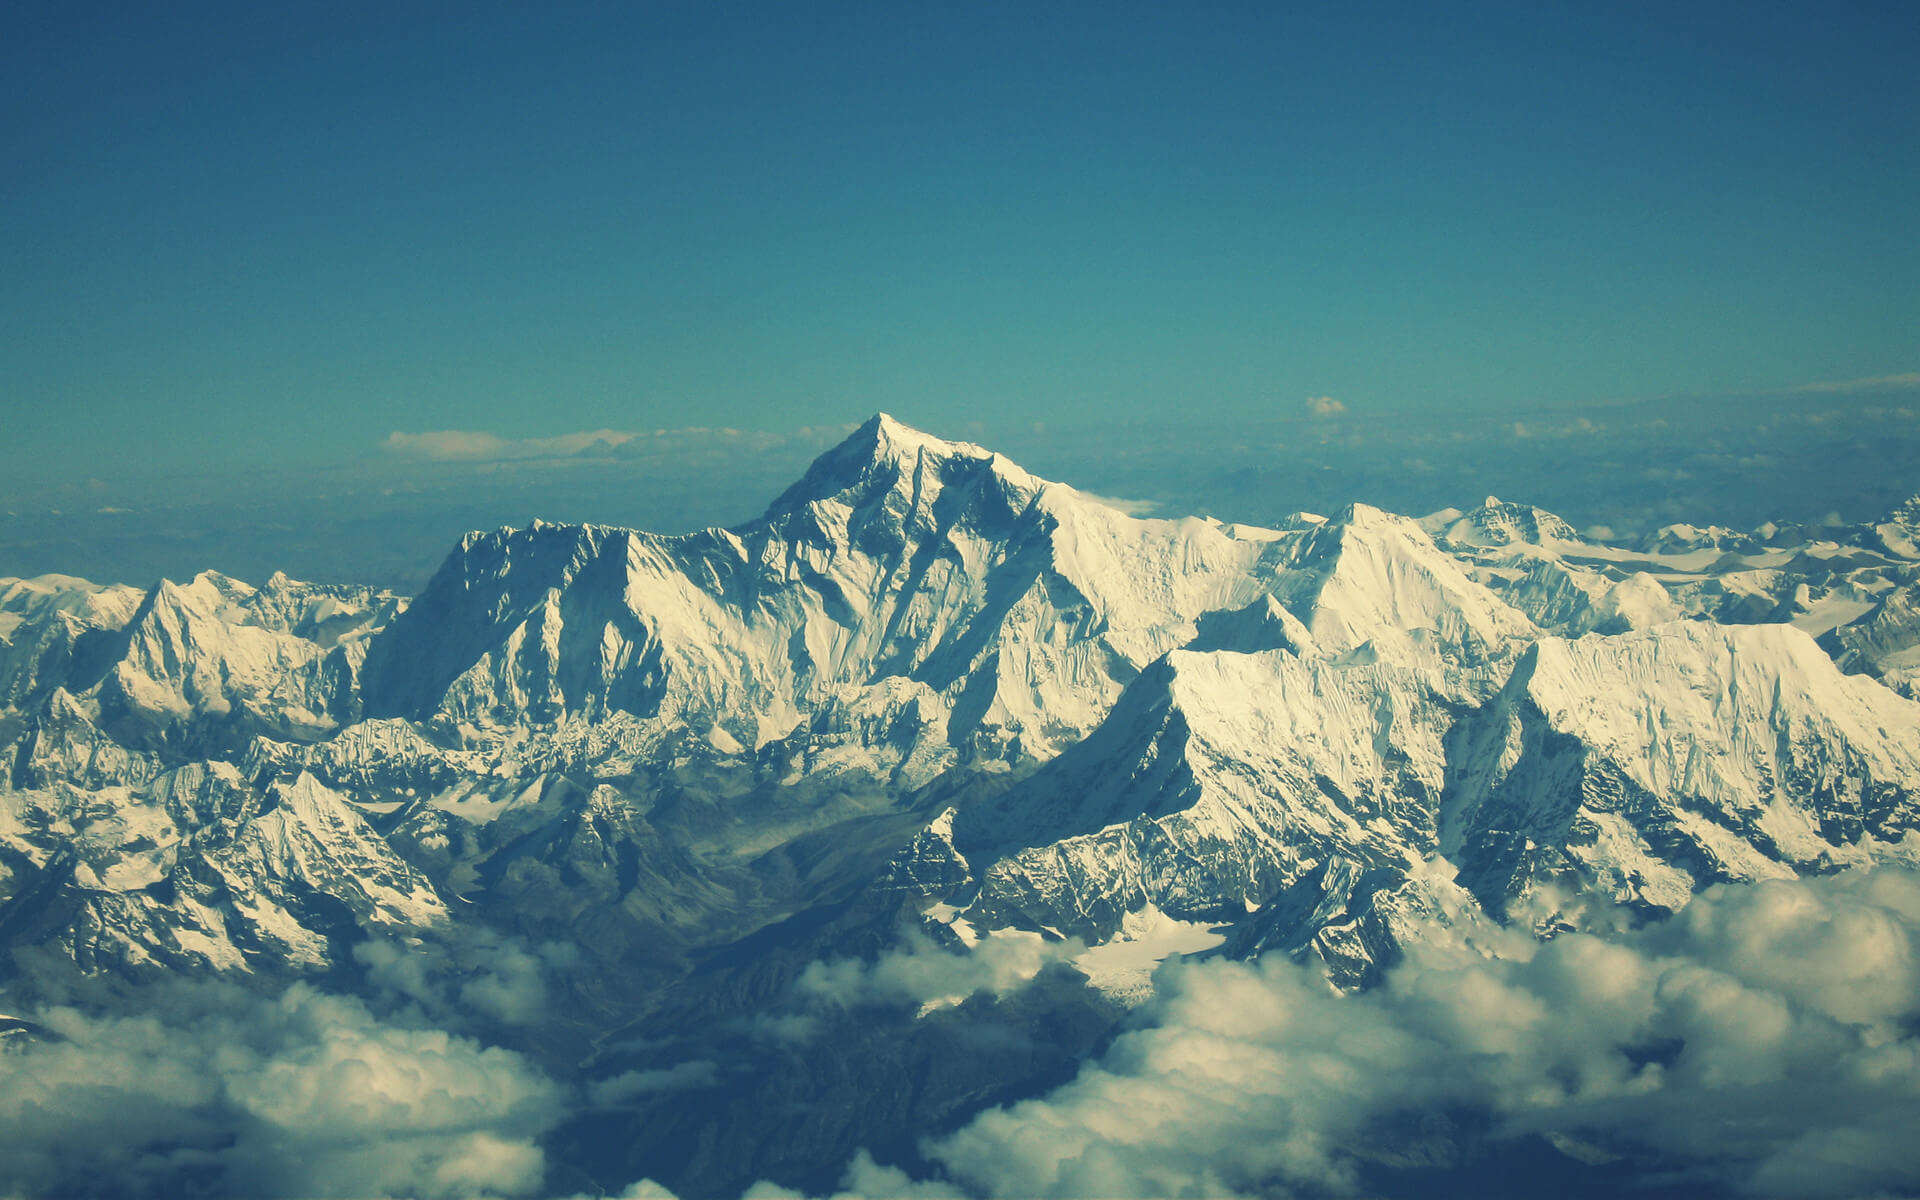 domande-colloquio-lavoro-header-foto-montagna